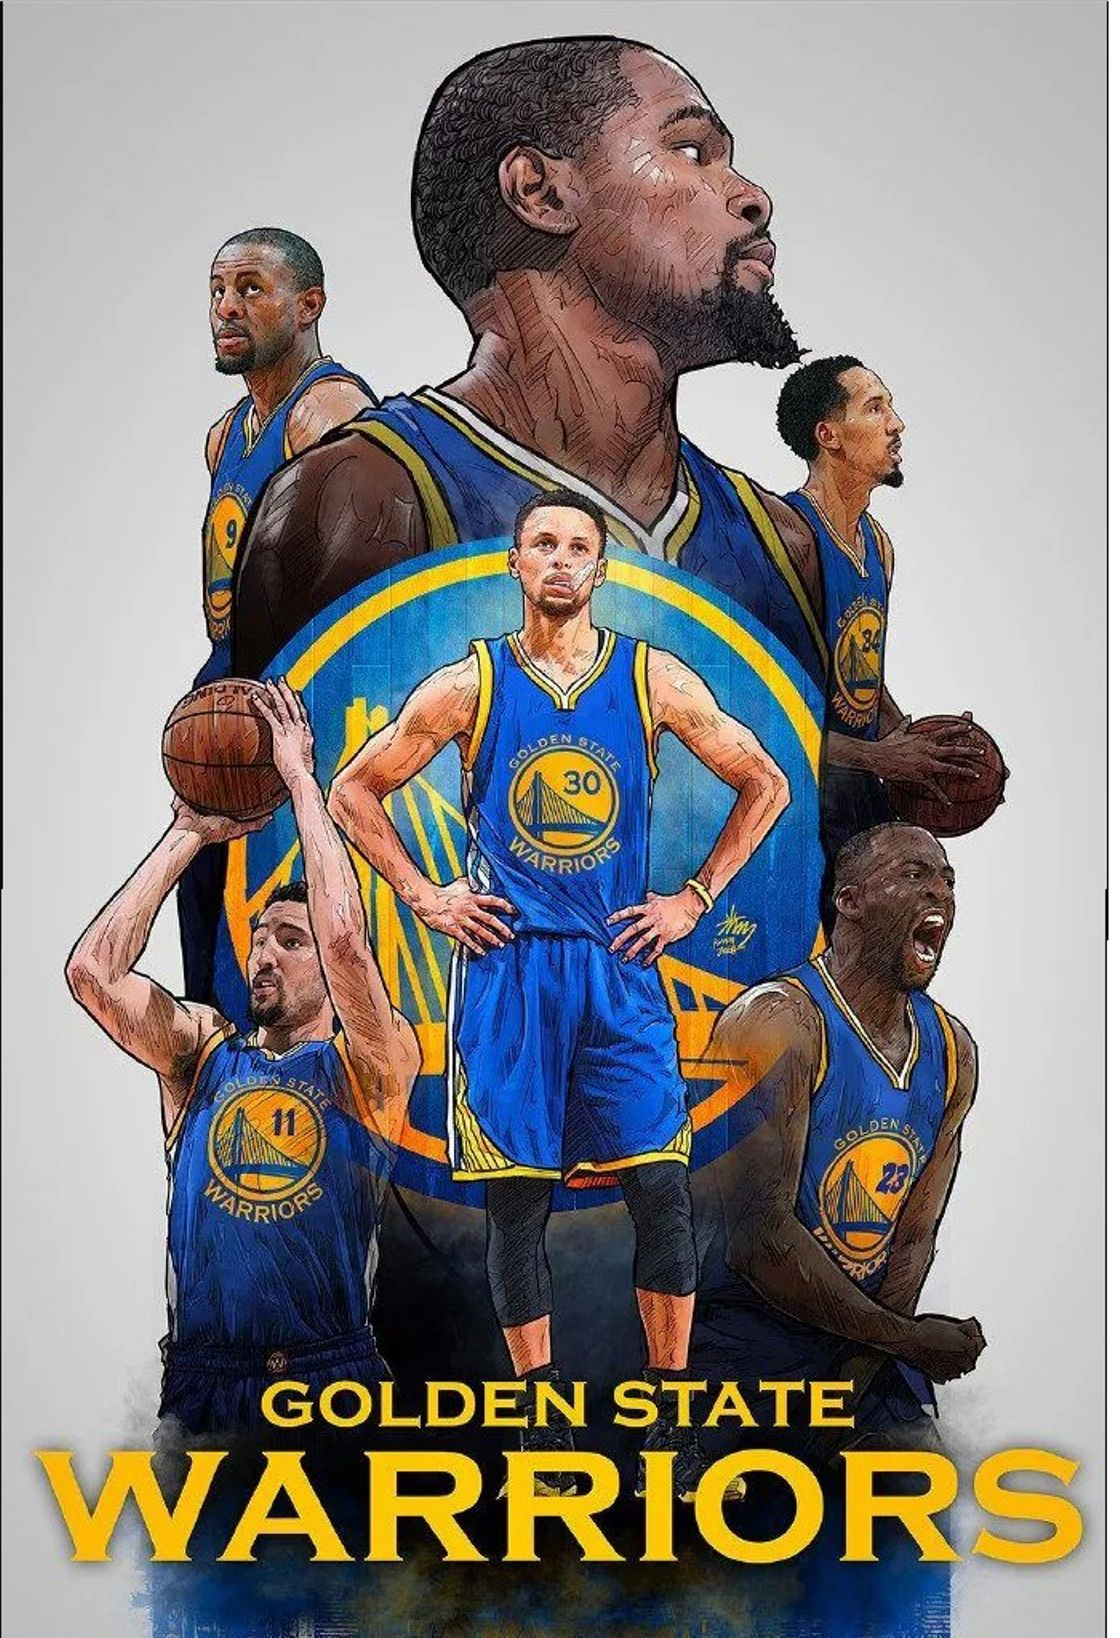 19+ DeMarcus Cousins Golden State Warriors Wallpapers - Wallpaper ... on WallpaperSafari